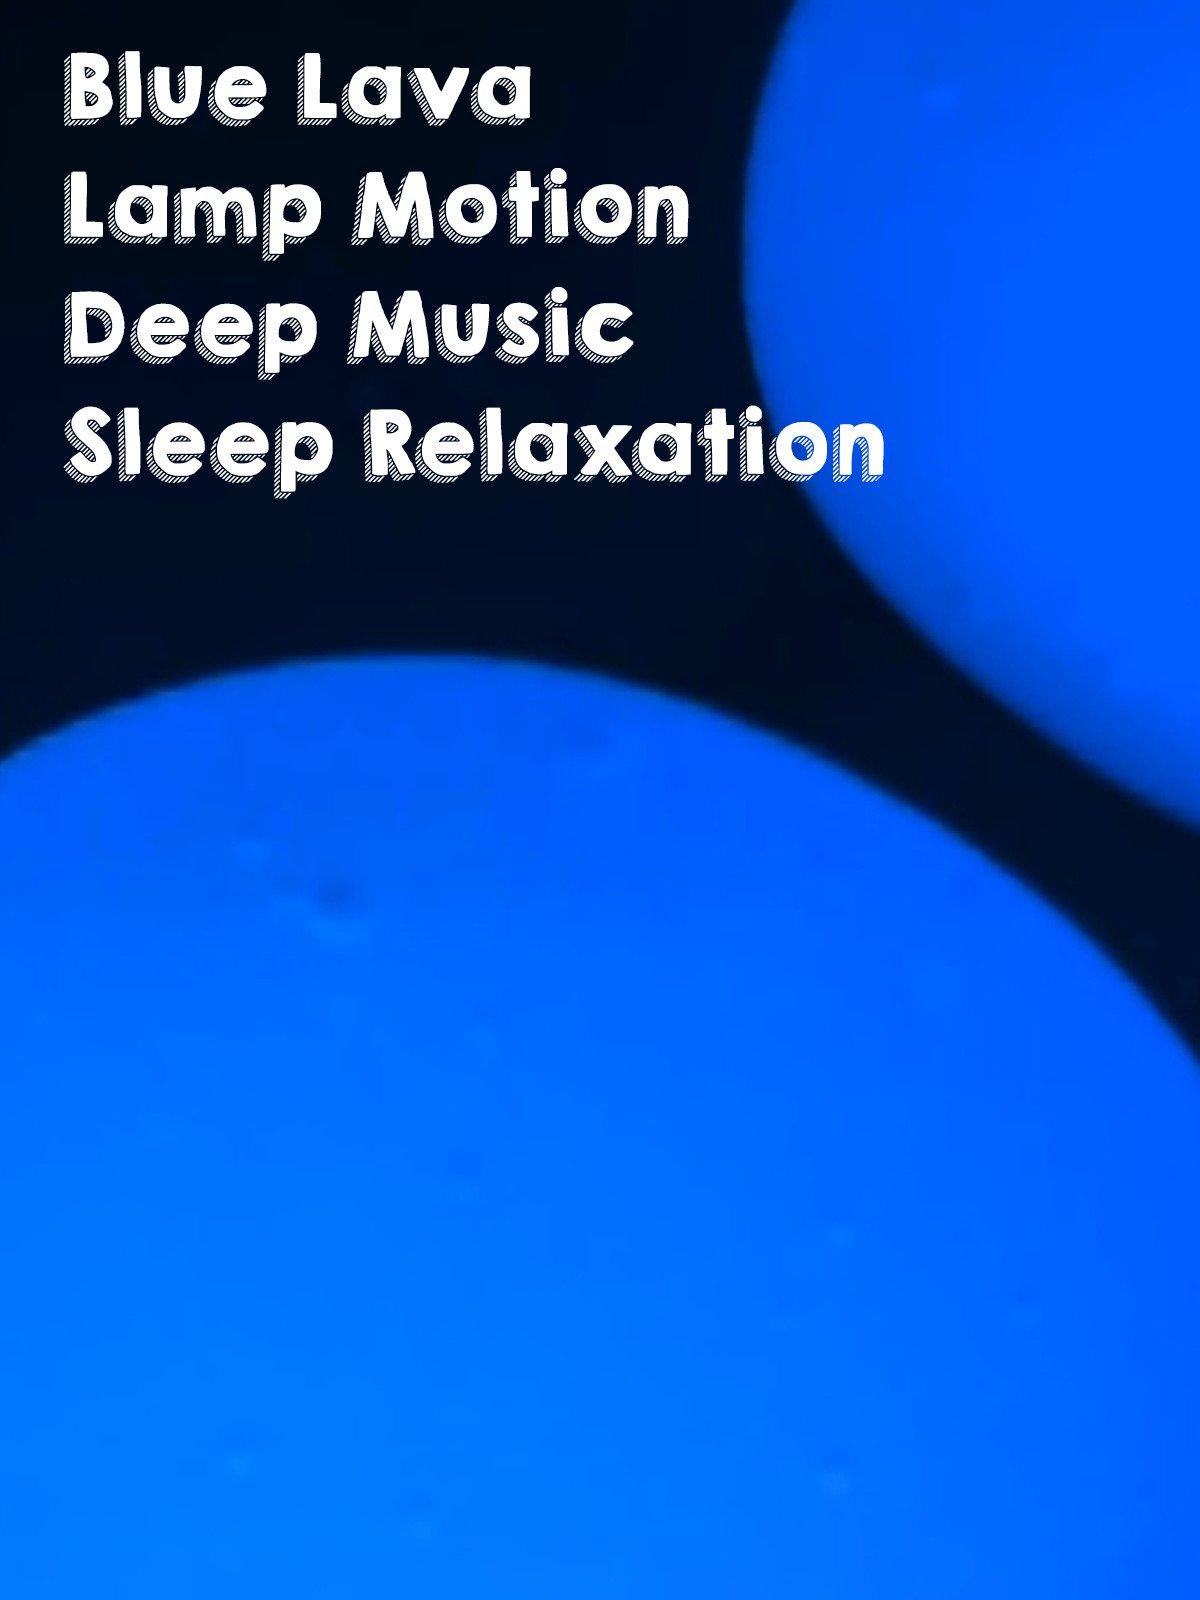 Blue Lava Lamp Motion Deep Music Sleep Relaxation